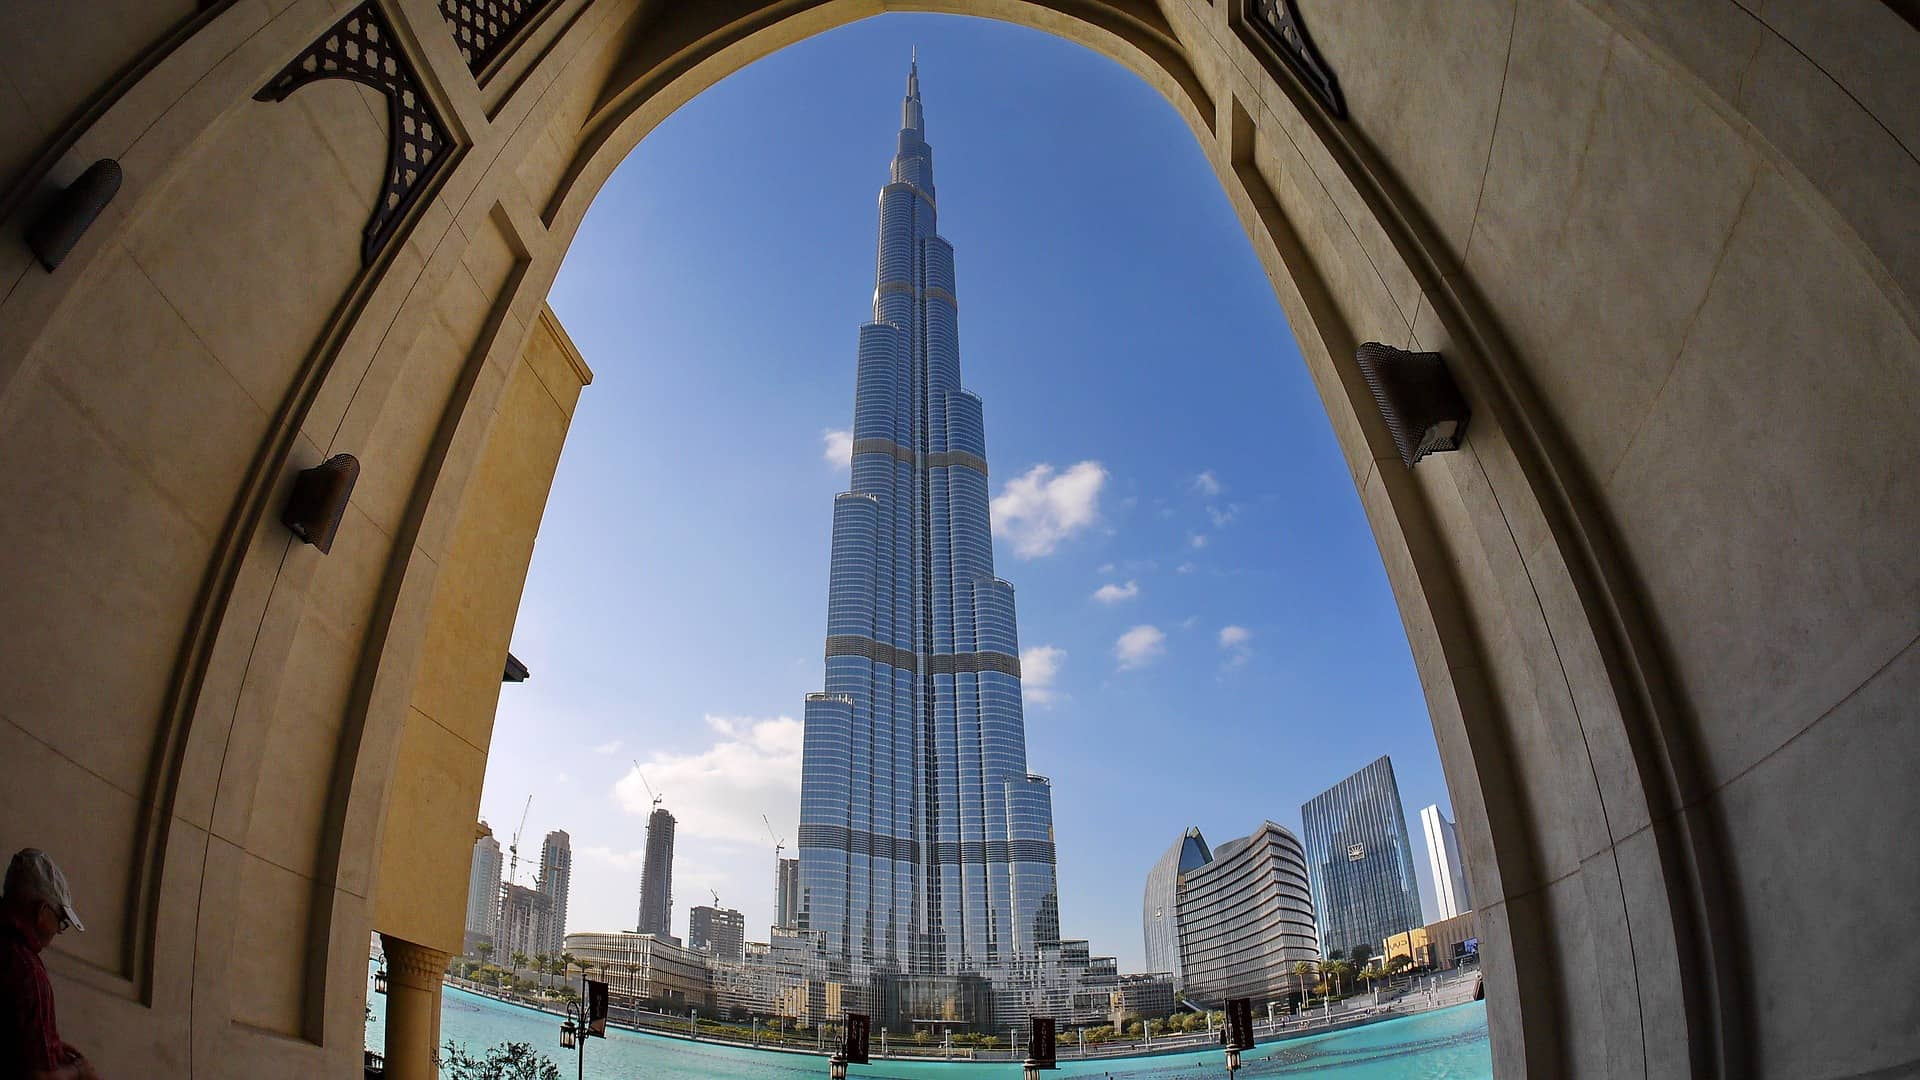 Voco Hotel - 4,5 Sterne ab 31,00€ die Nacht Dubai